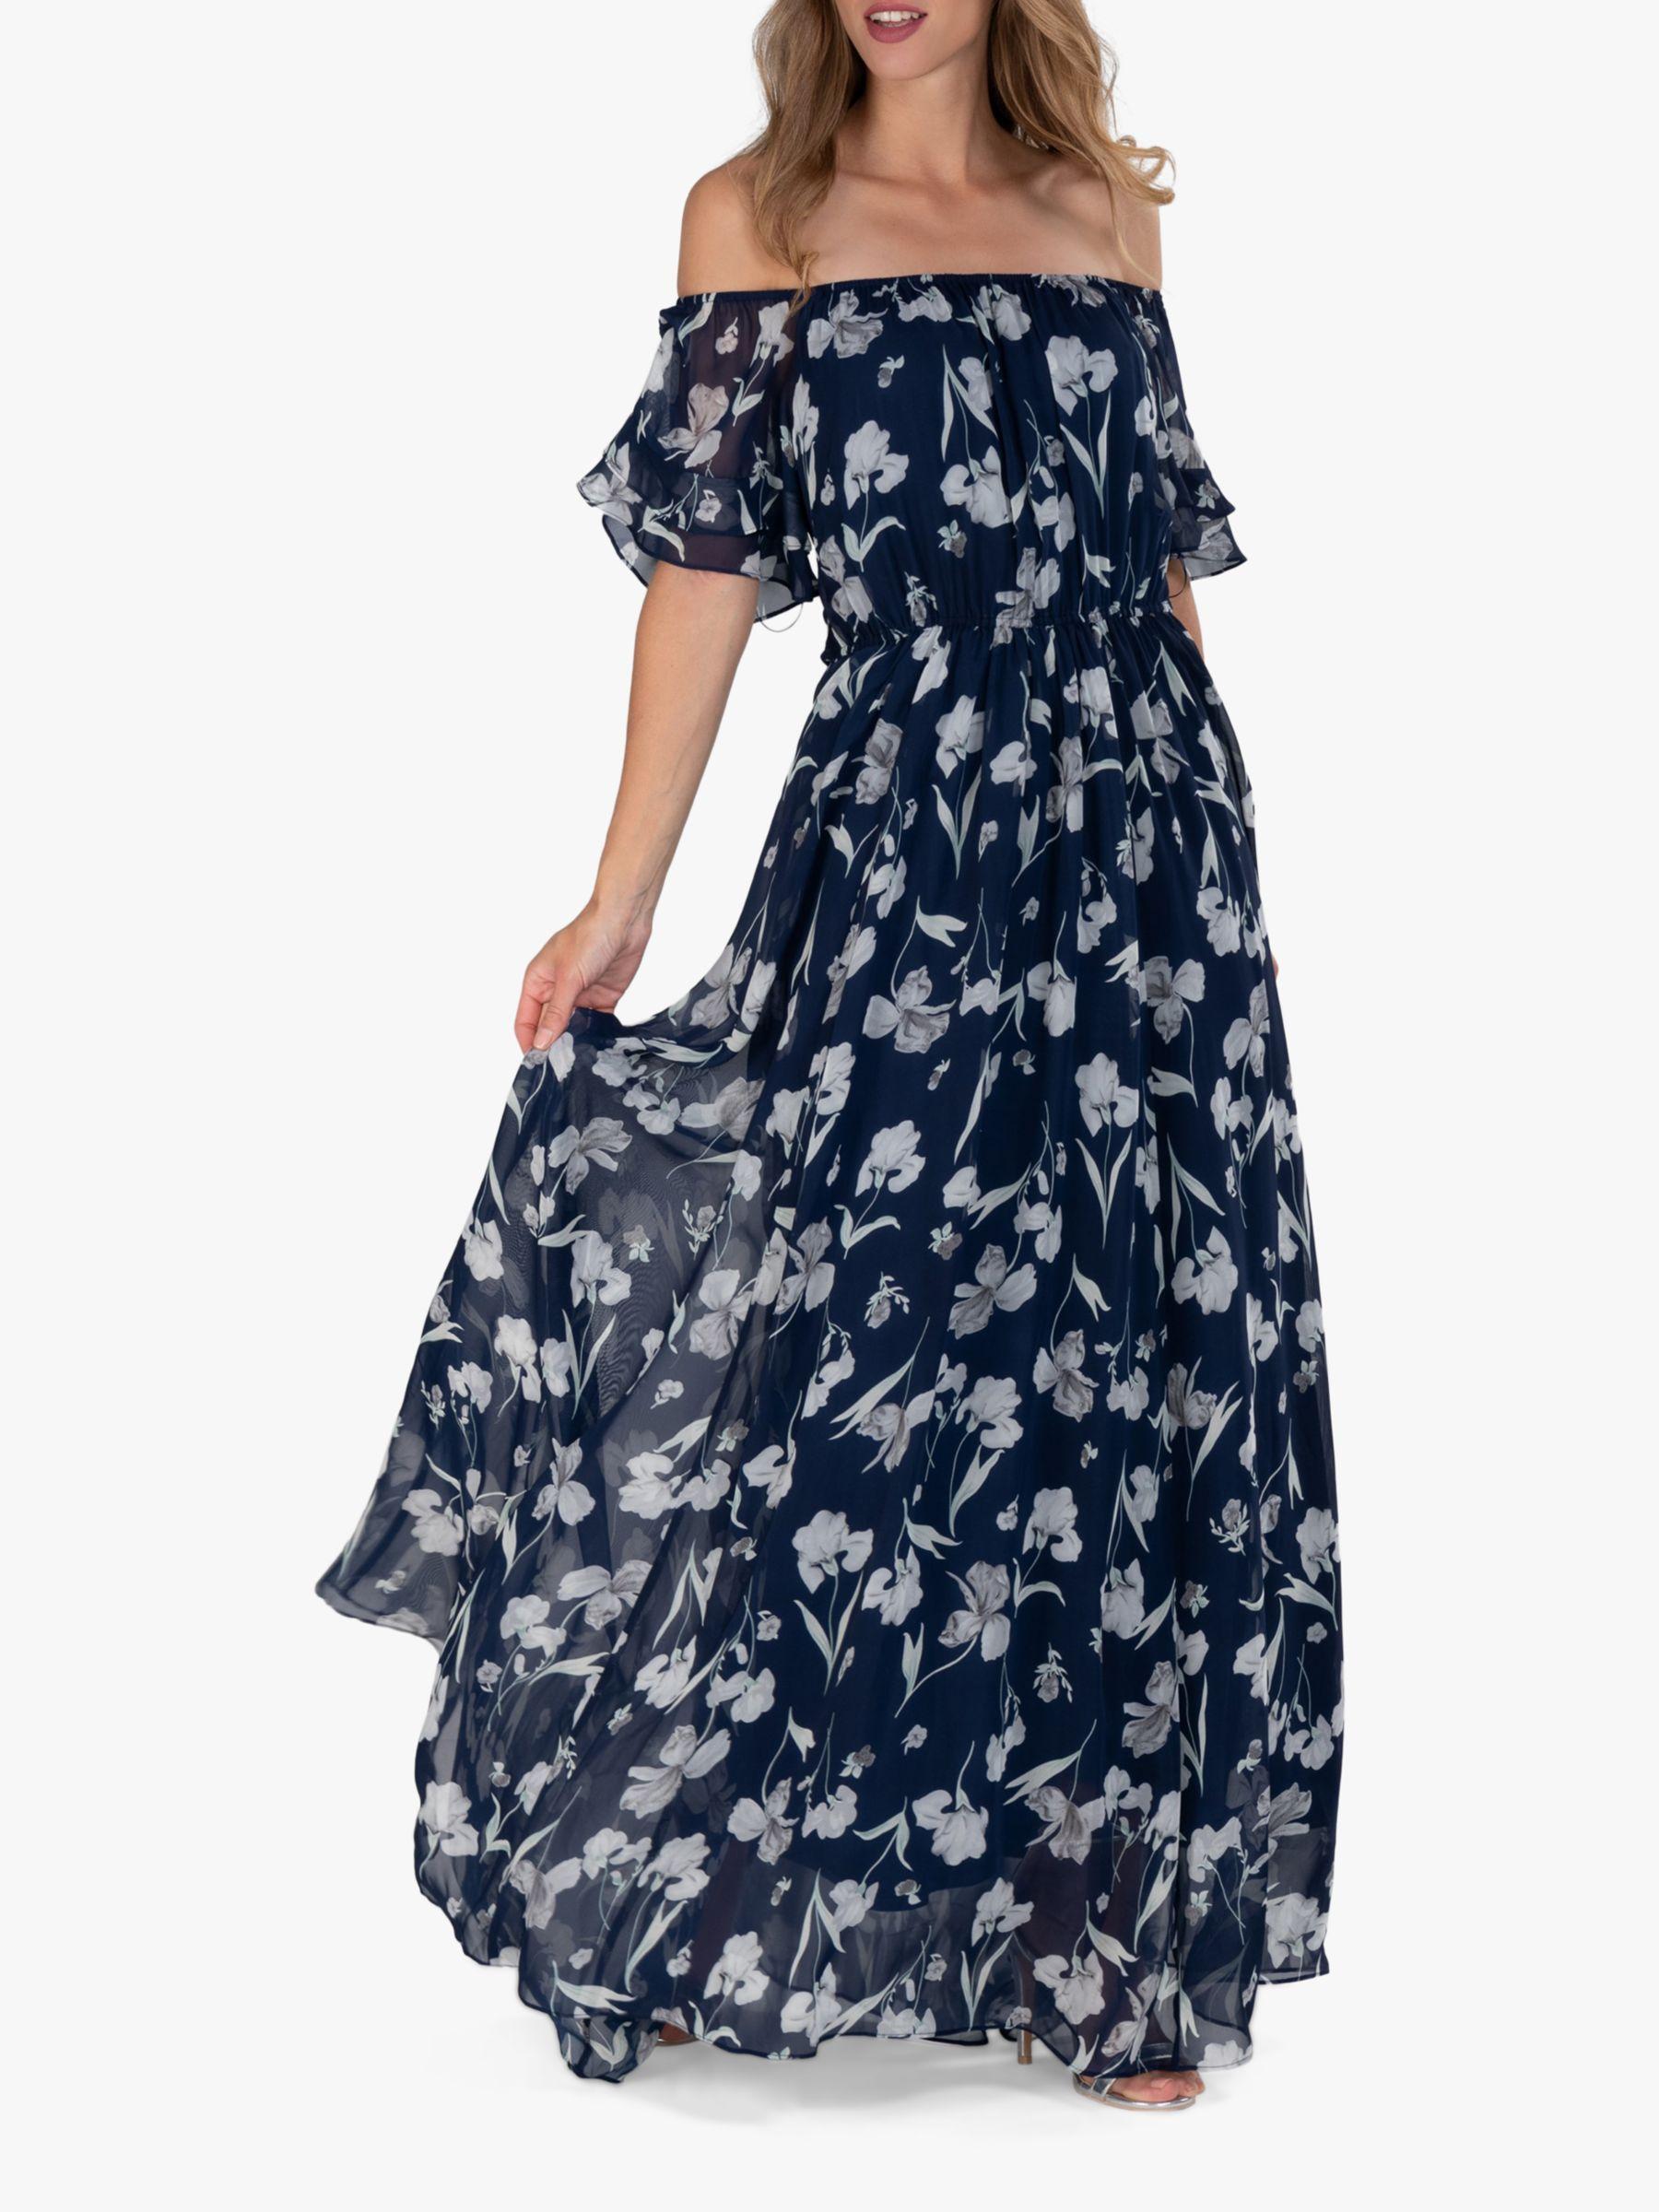 Jolie Moi Off Shoulder Floral Maxi Dress Navy Floral Maxi Dress Beautiful Maxi Dresses Maxi Dress [ 2400 x 1800 Pixel ]